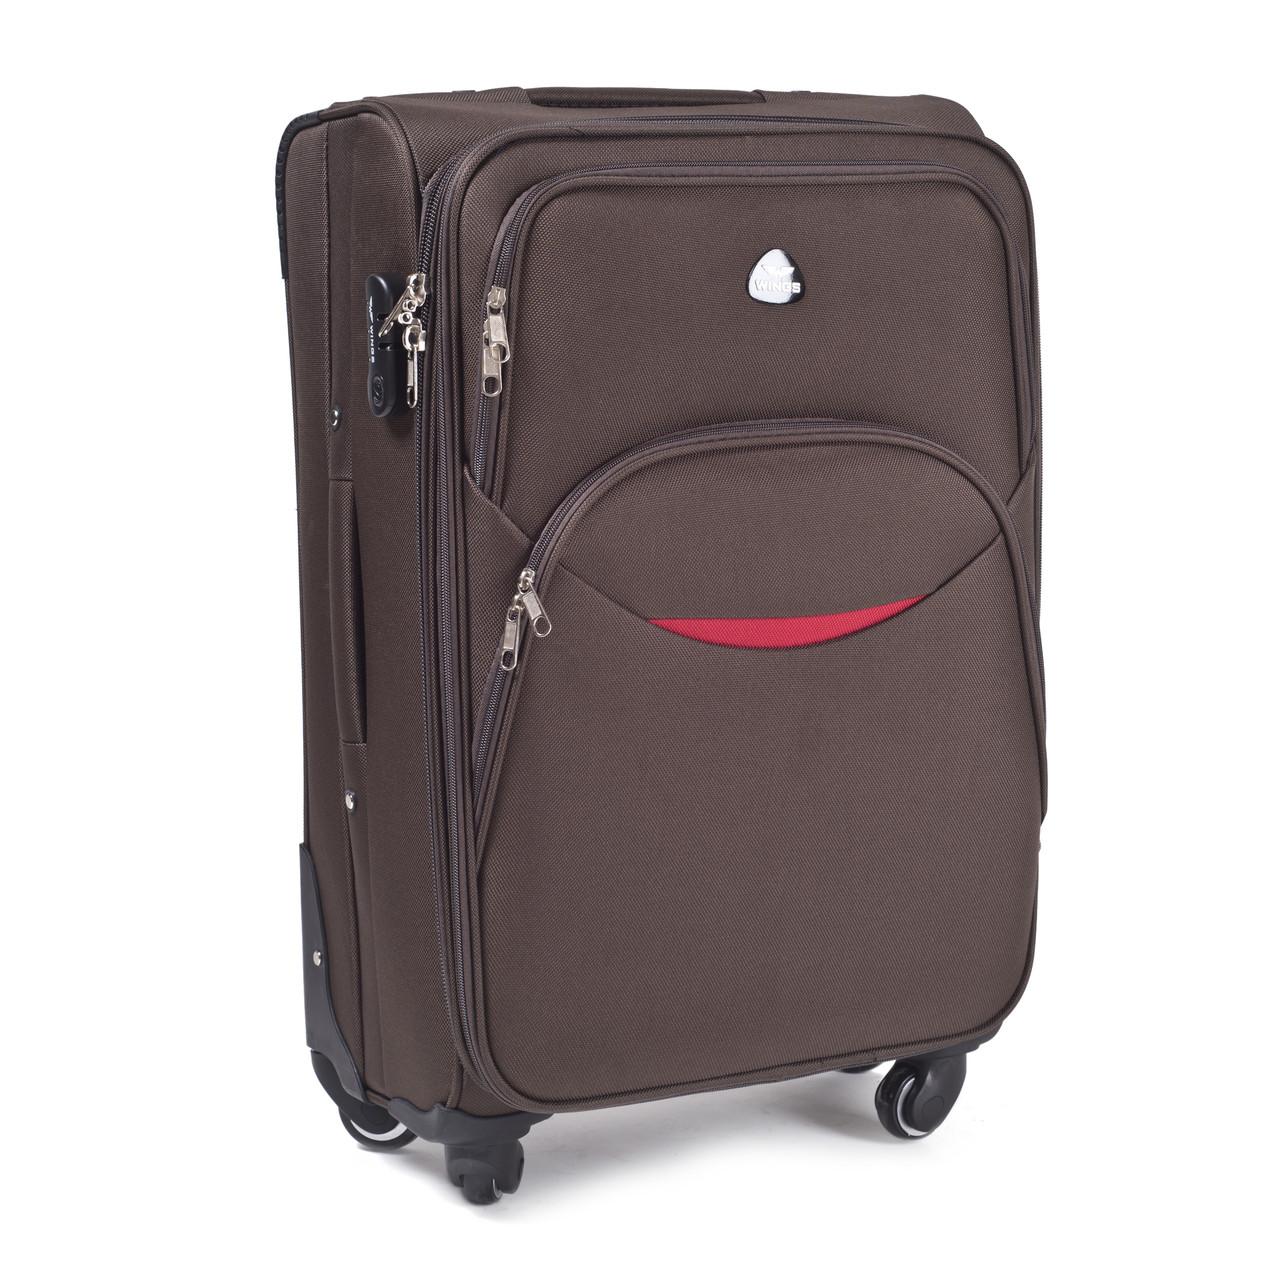 Средний тканевый чемодан Wings 1708 на 4 колесах коричневый